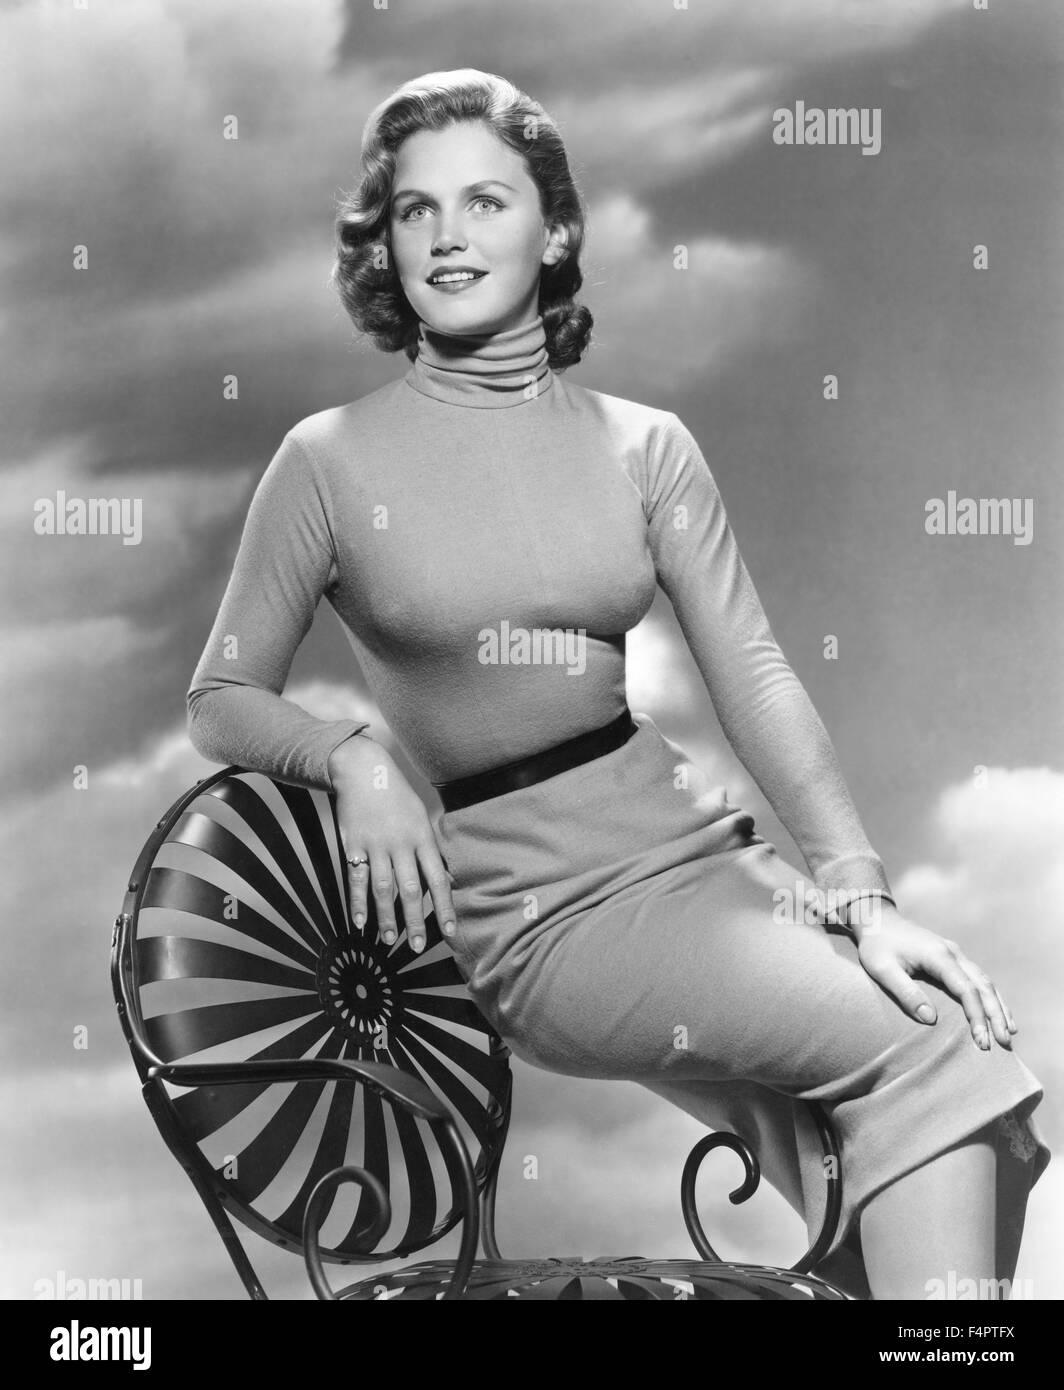 Lee Remick 1957 [Warner Bros. Pictures] - Stock Image